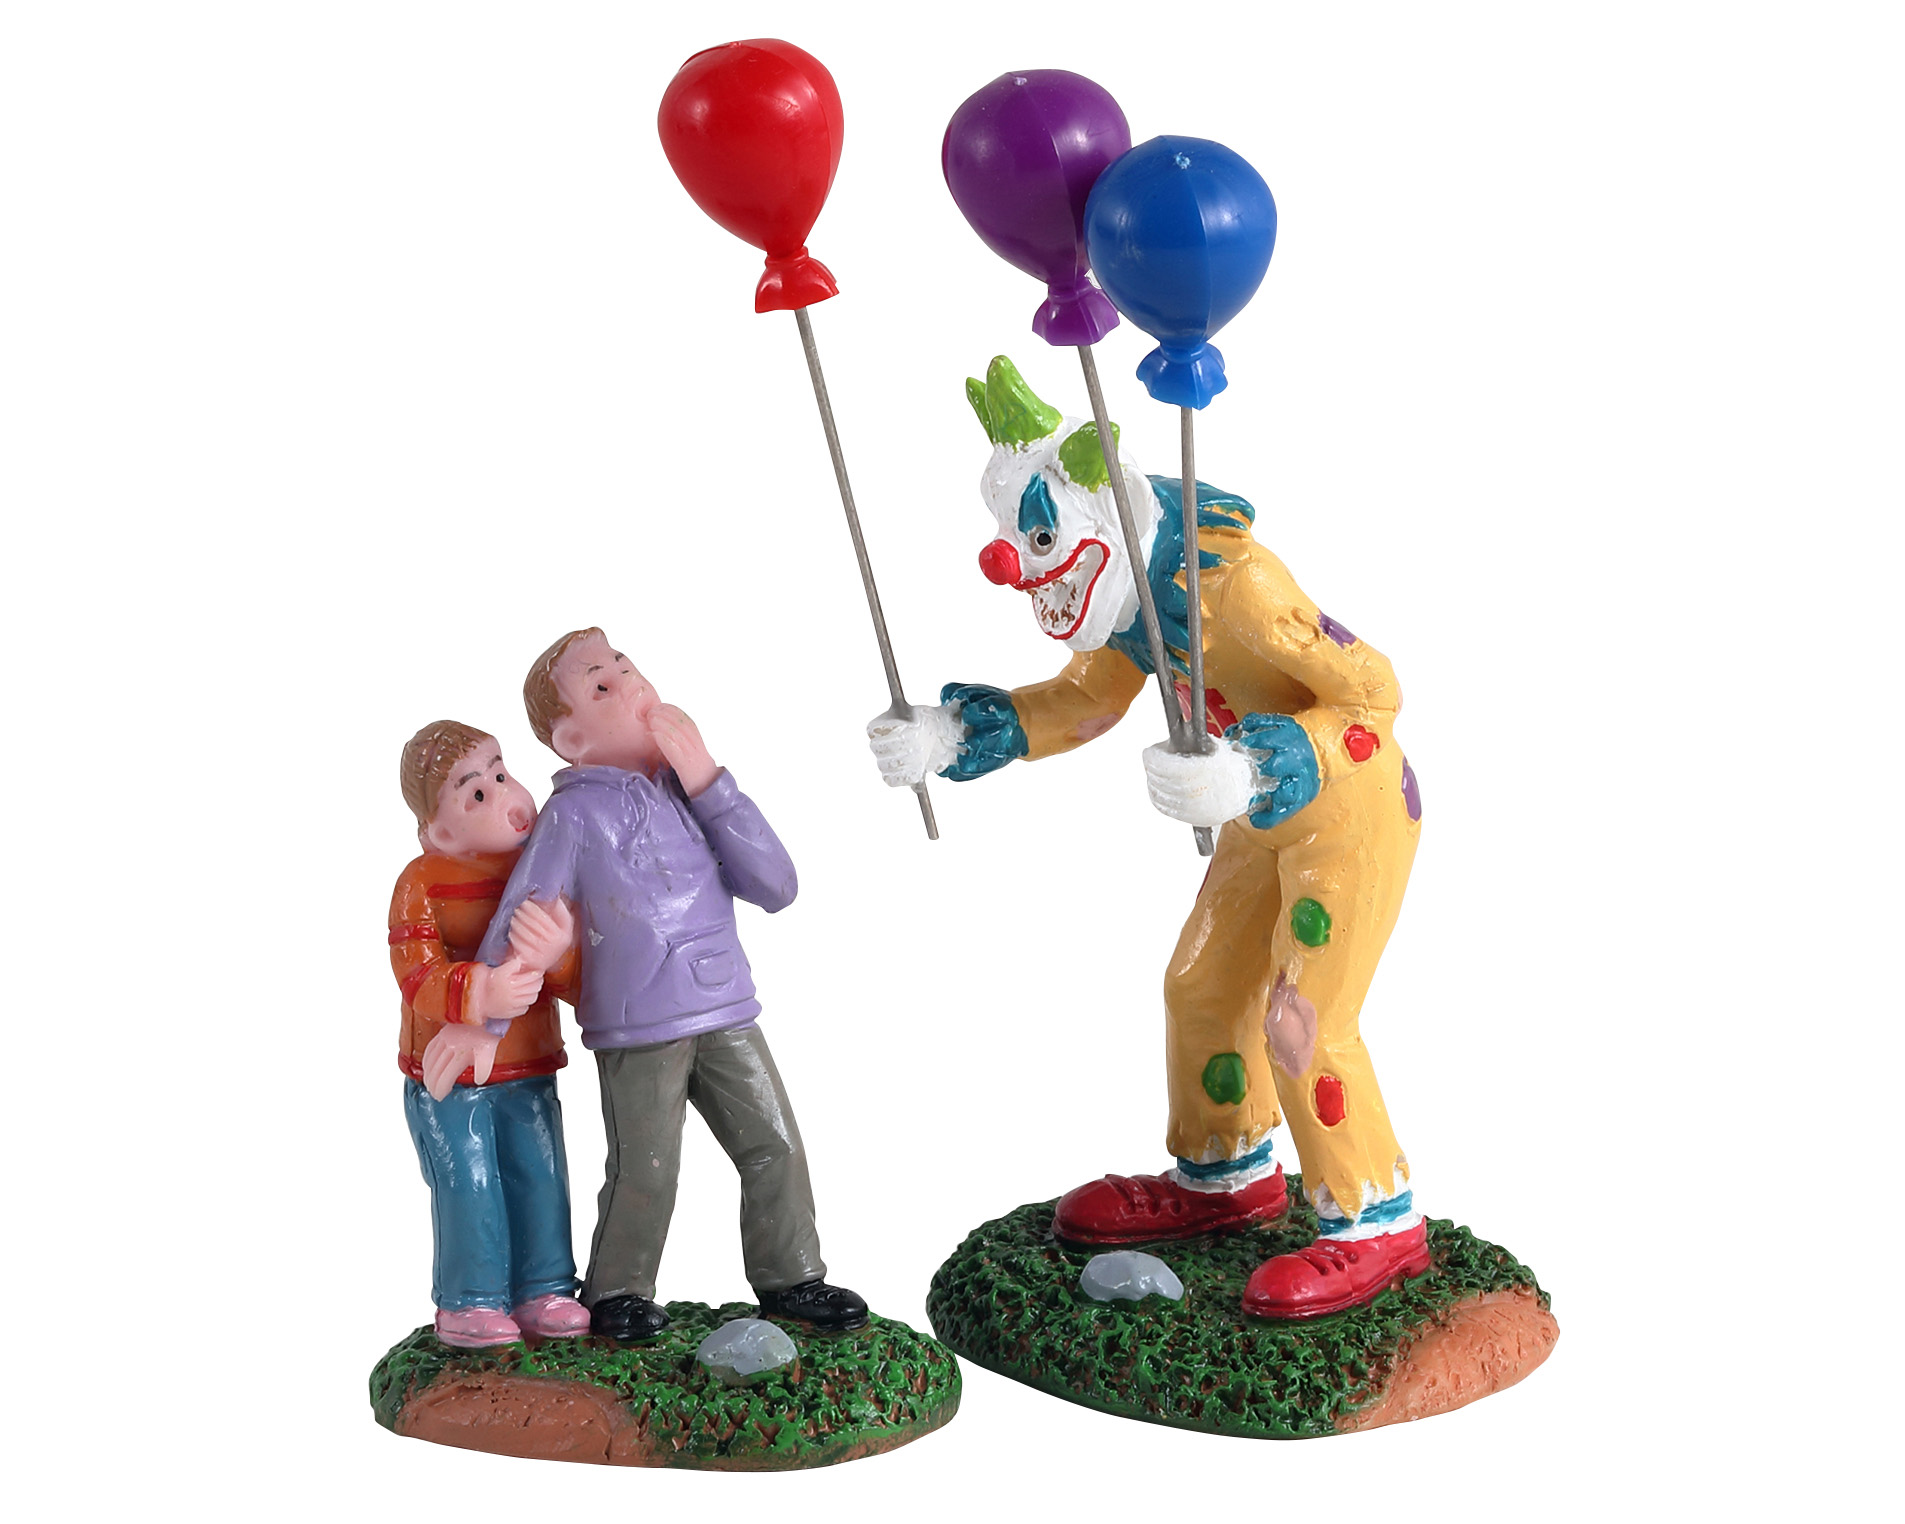 Creepy balloon seller, set of 2